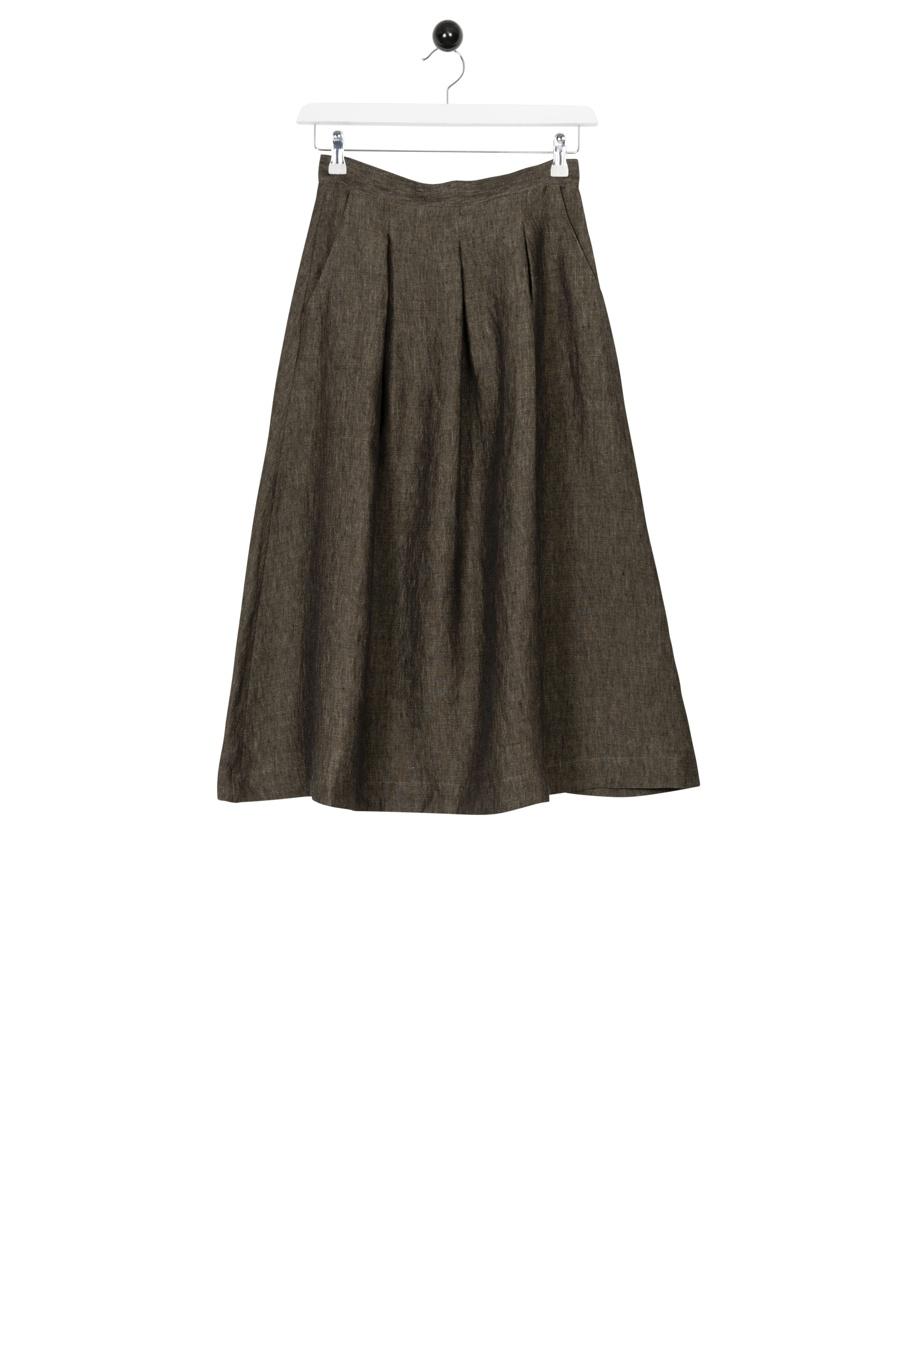 Rochefort Skirt